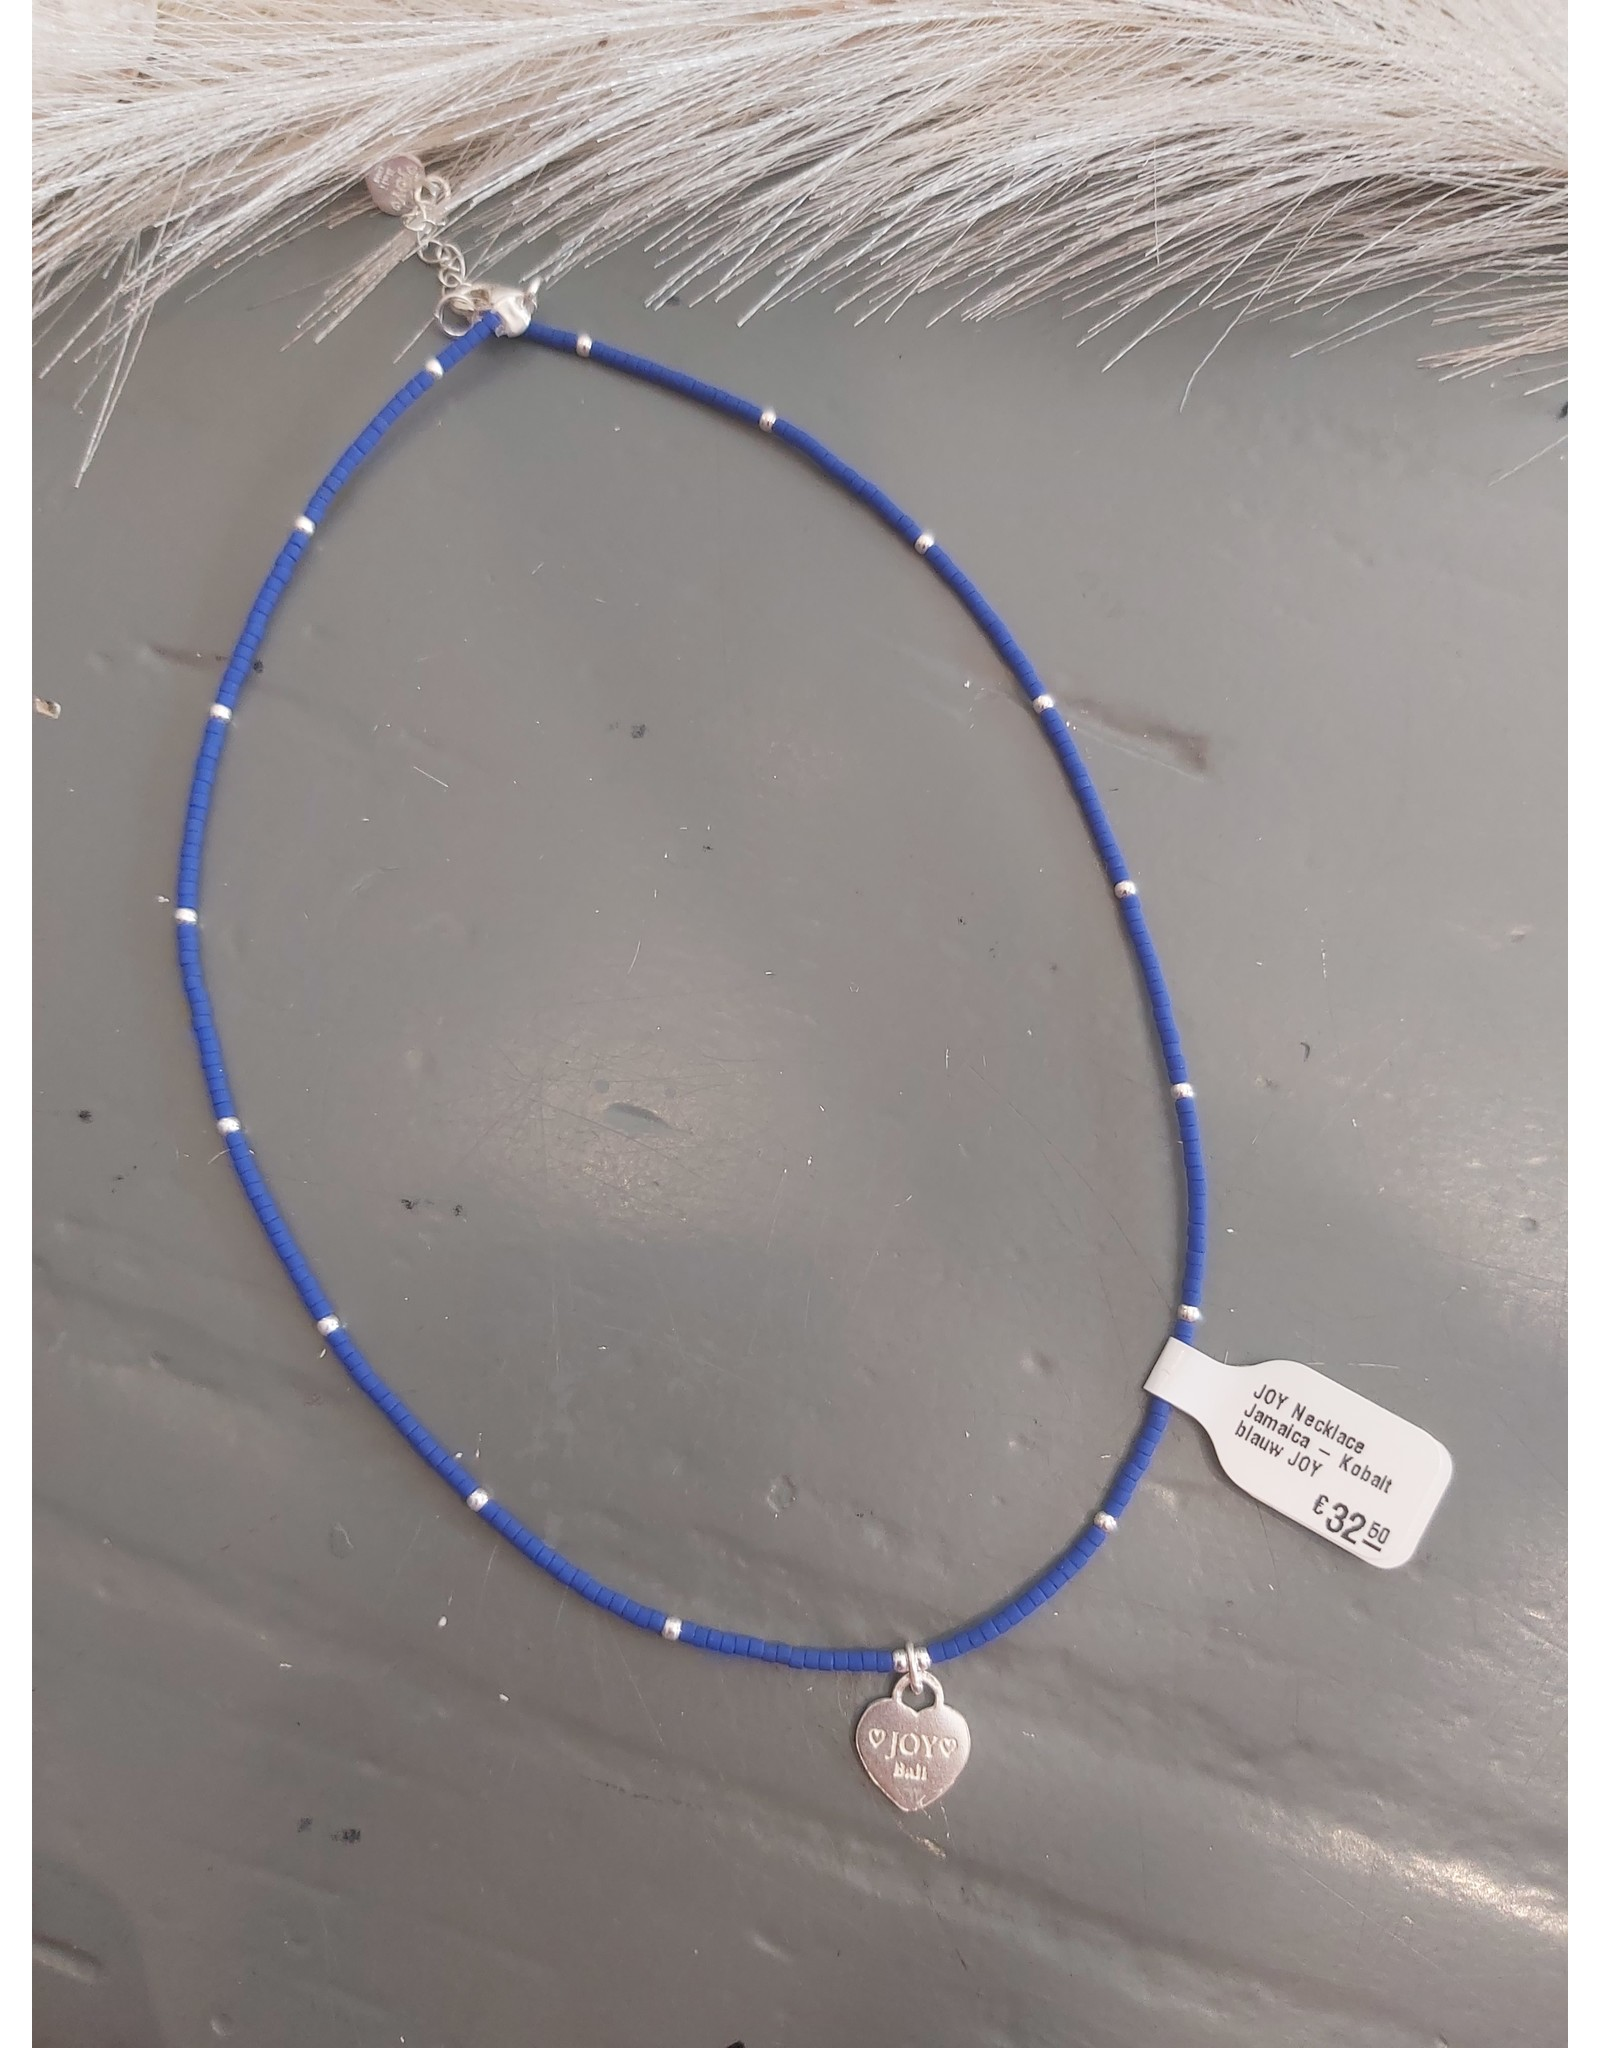 Joy Bali JOY Necklace Jamaica - Kobalt blauw